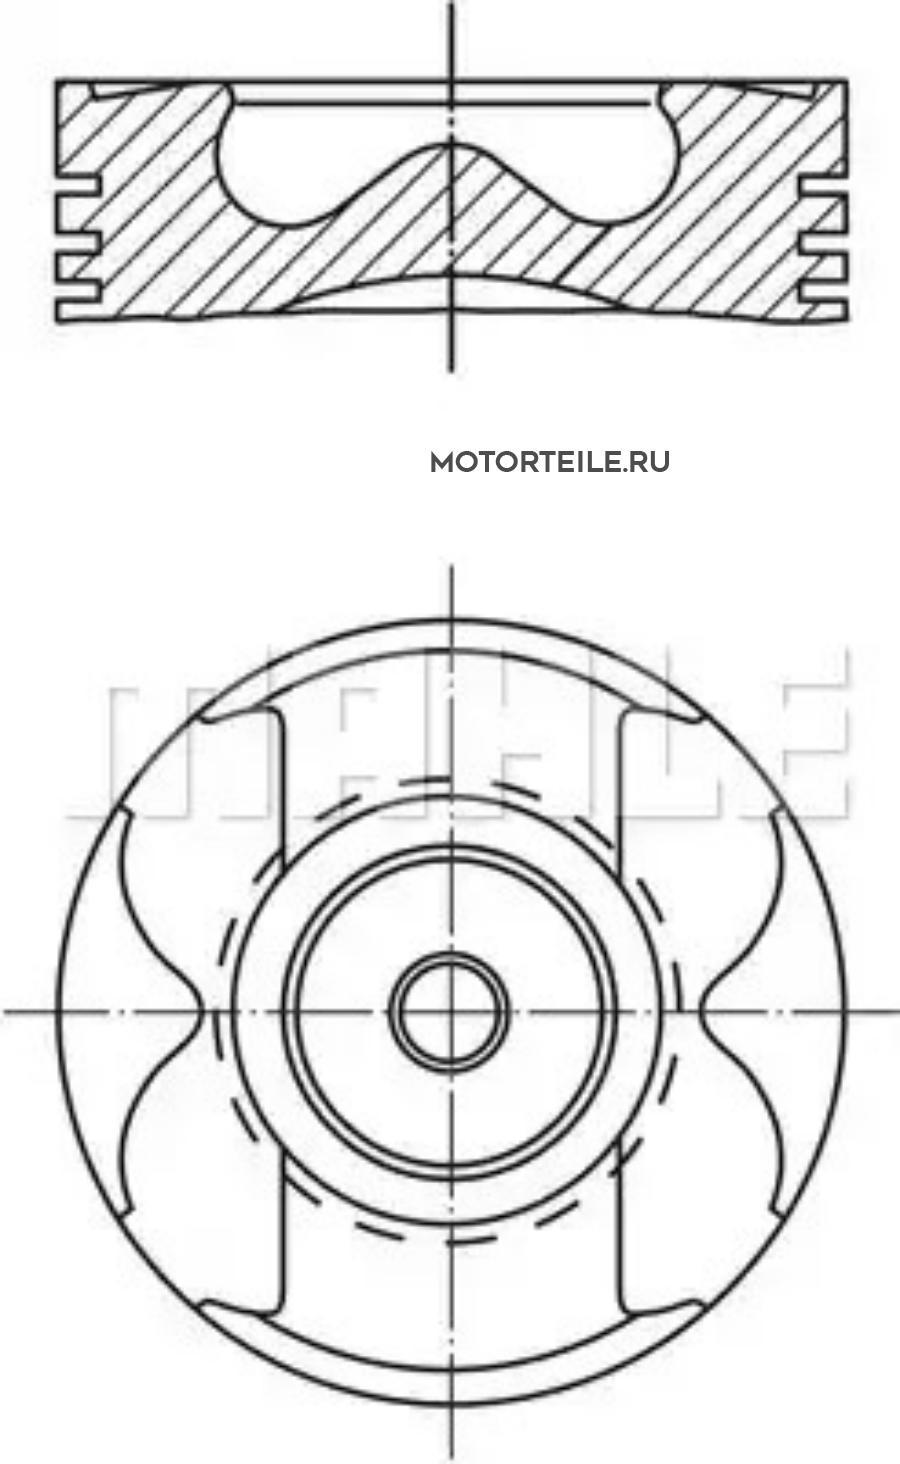 Поршнекомплект MB OM611 | OM612 | OM613 220D | 270D | 320D 1999-> d88.0+1.00 палец 30mm